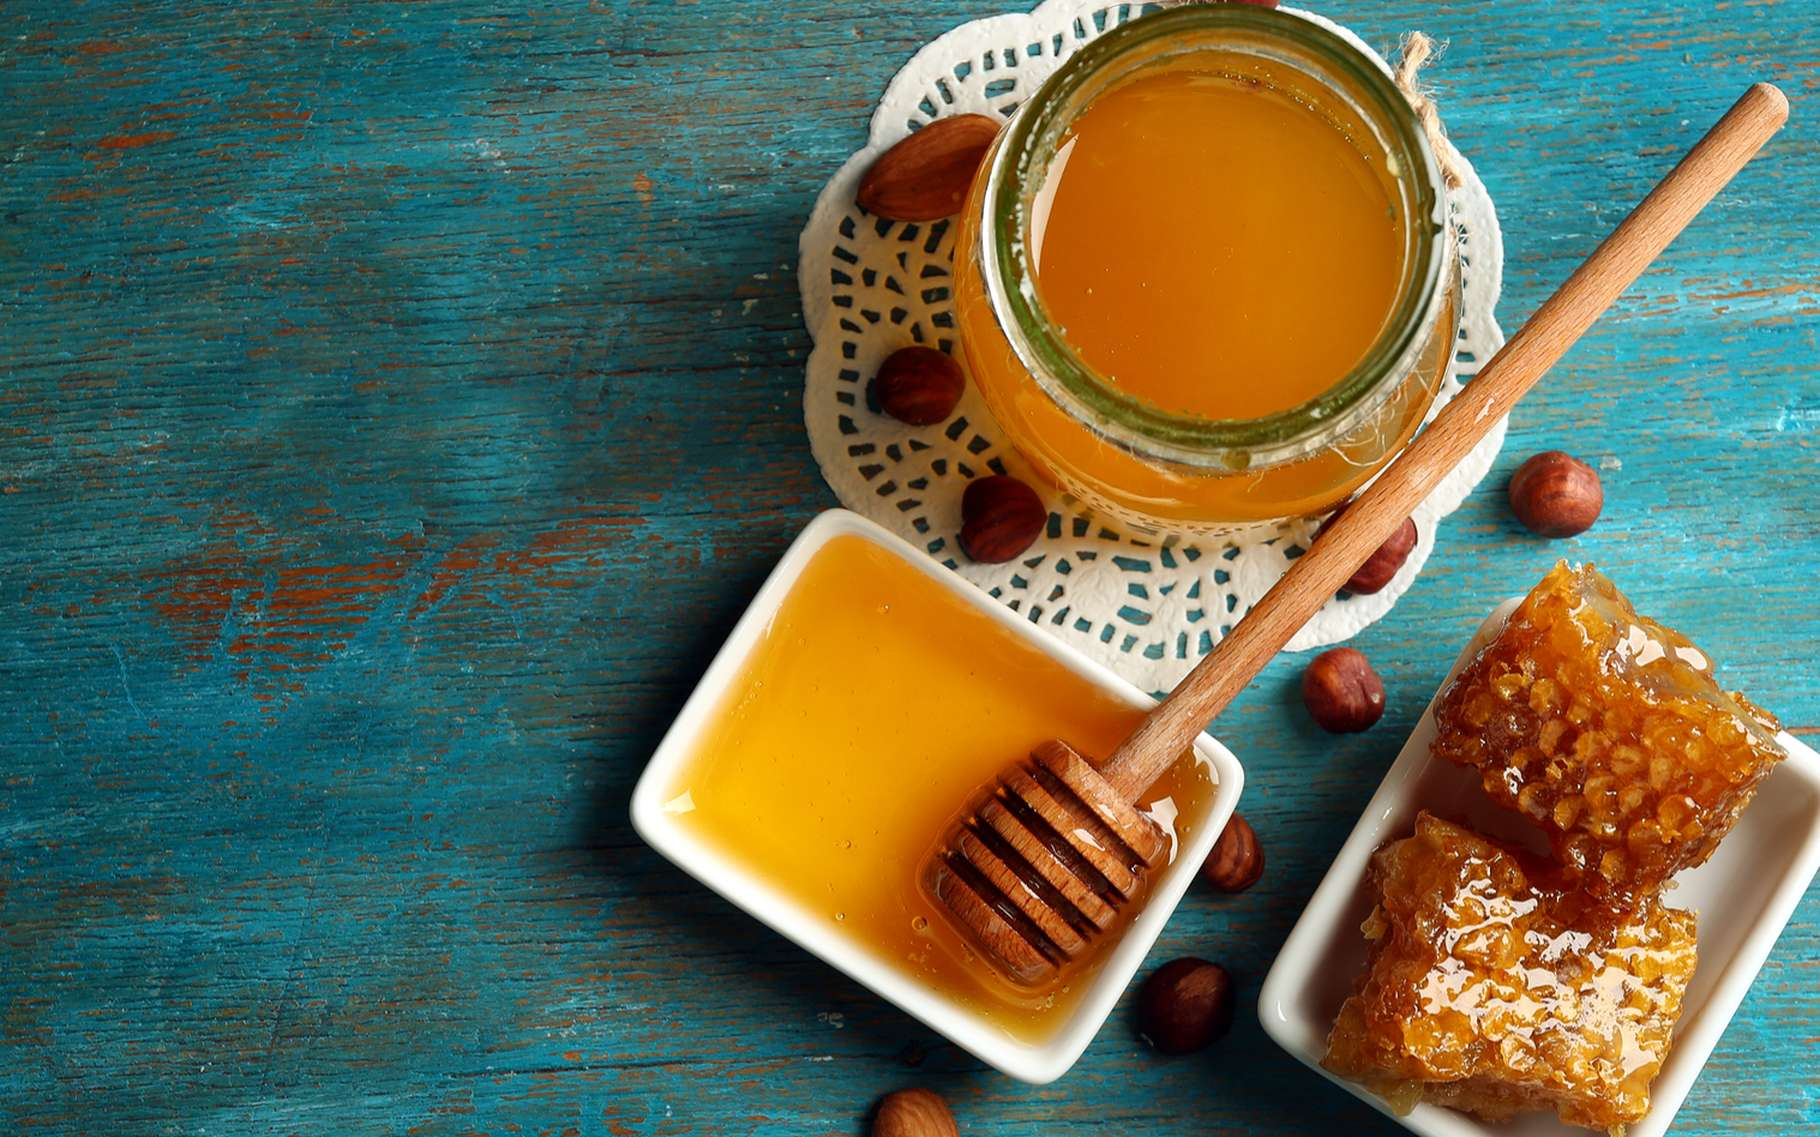 Du miel pour soigner la sinusite ? © Africa Studio, Shuttestock